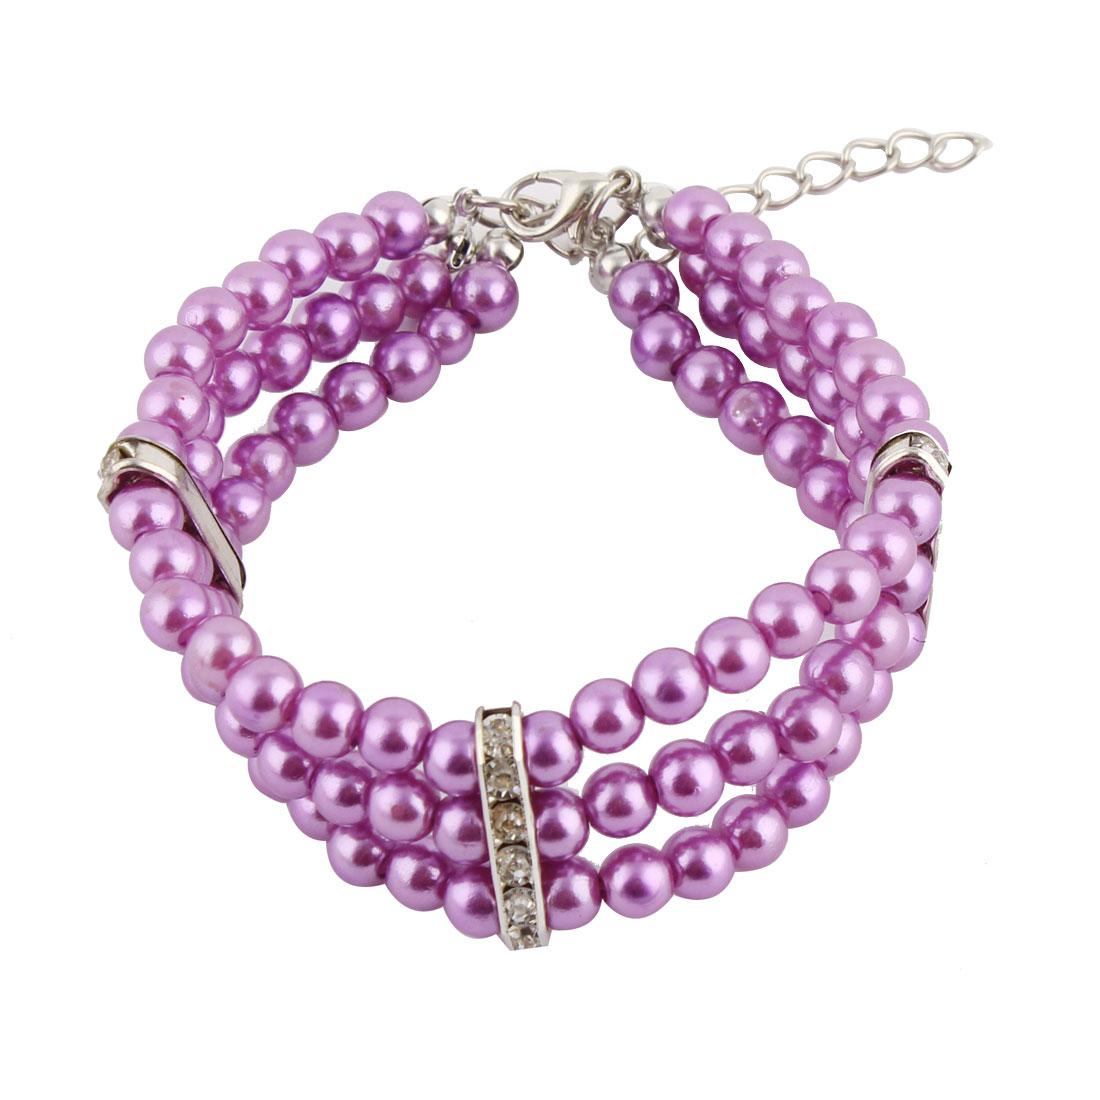 Pet Dog Plastic Three Rows Round Beads Linked Collar Necklace Purple